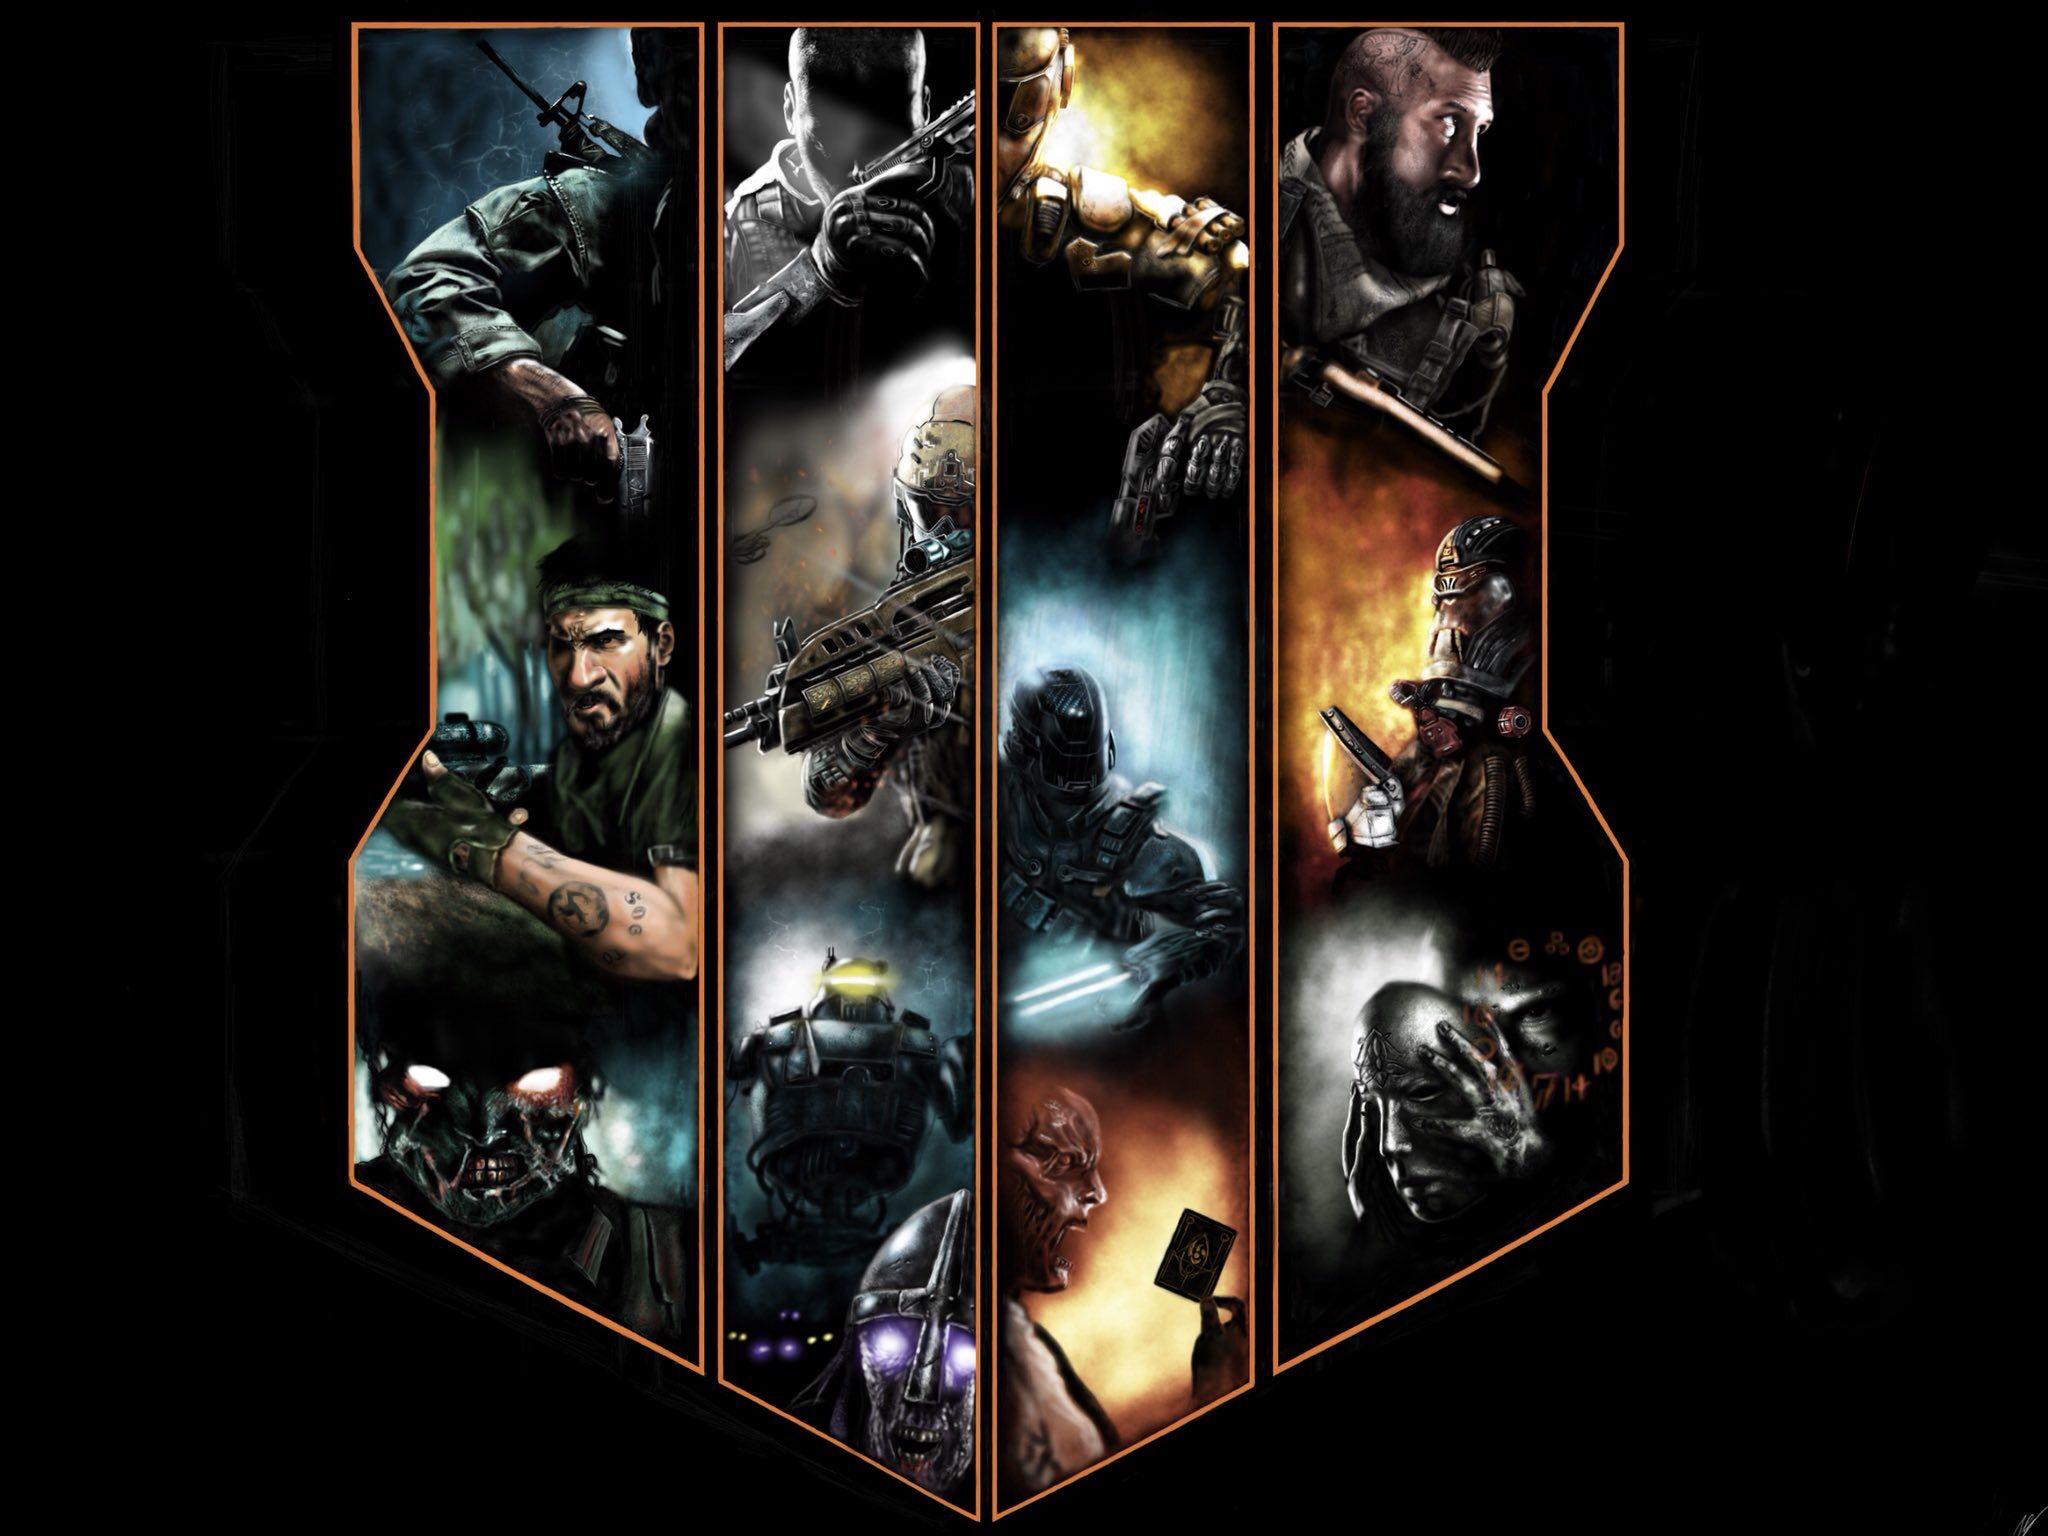 Fanart Call Of Duty Black Ops 4 Fondos De Pantalla De Juegos Fondos De Pantalla Black Black Ops